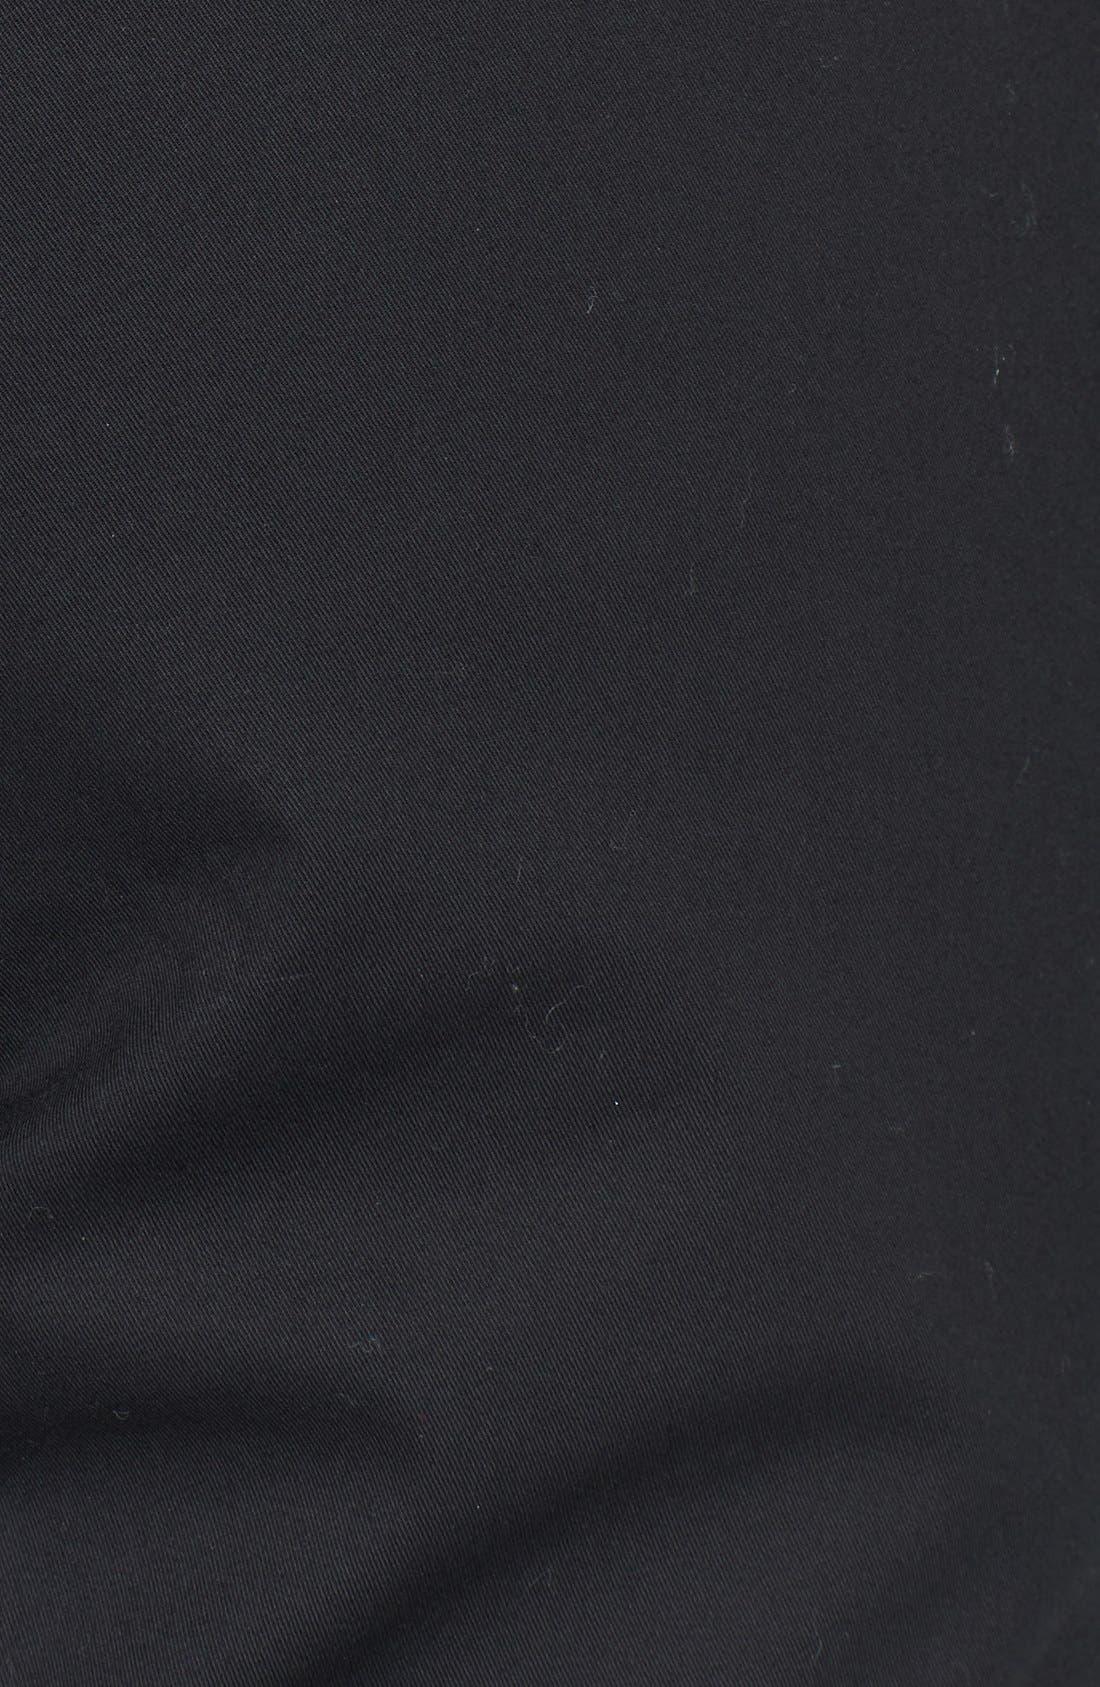 Alternate Image 3  - 3.1 Phillip Lim Crop Stretch Cotton Pencil Trousers